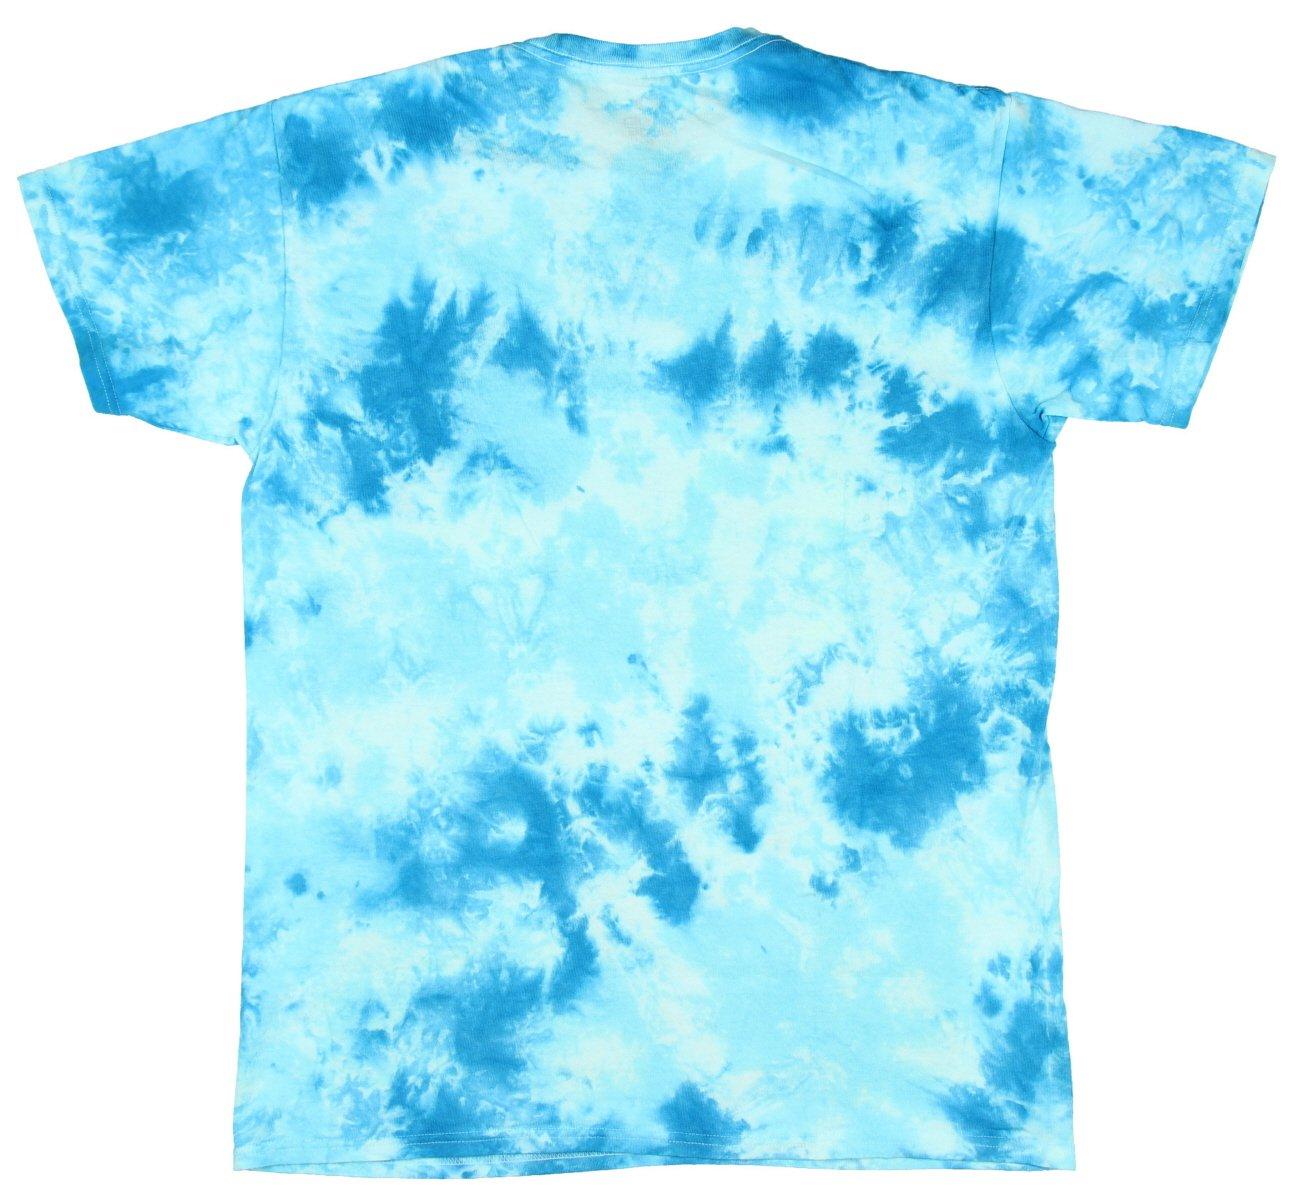 d06a27be6def00 Amazon.co.uk  tie dye t shirt - Tops   T-Shirts   Women  Clothing